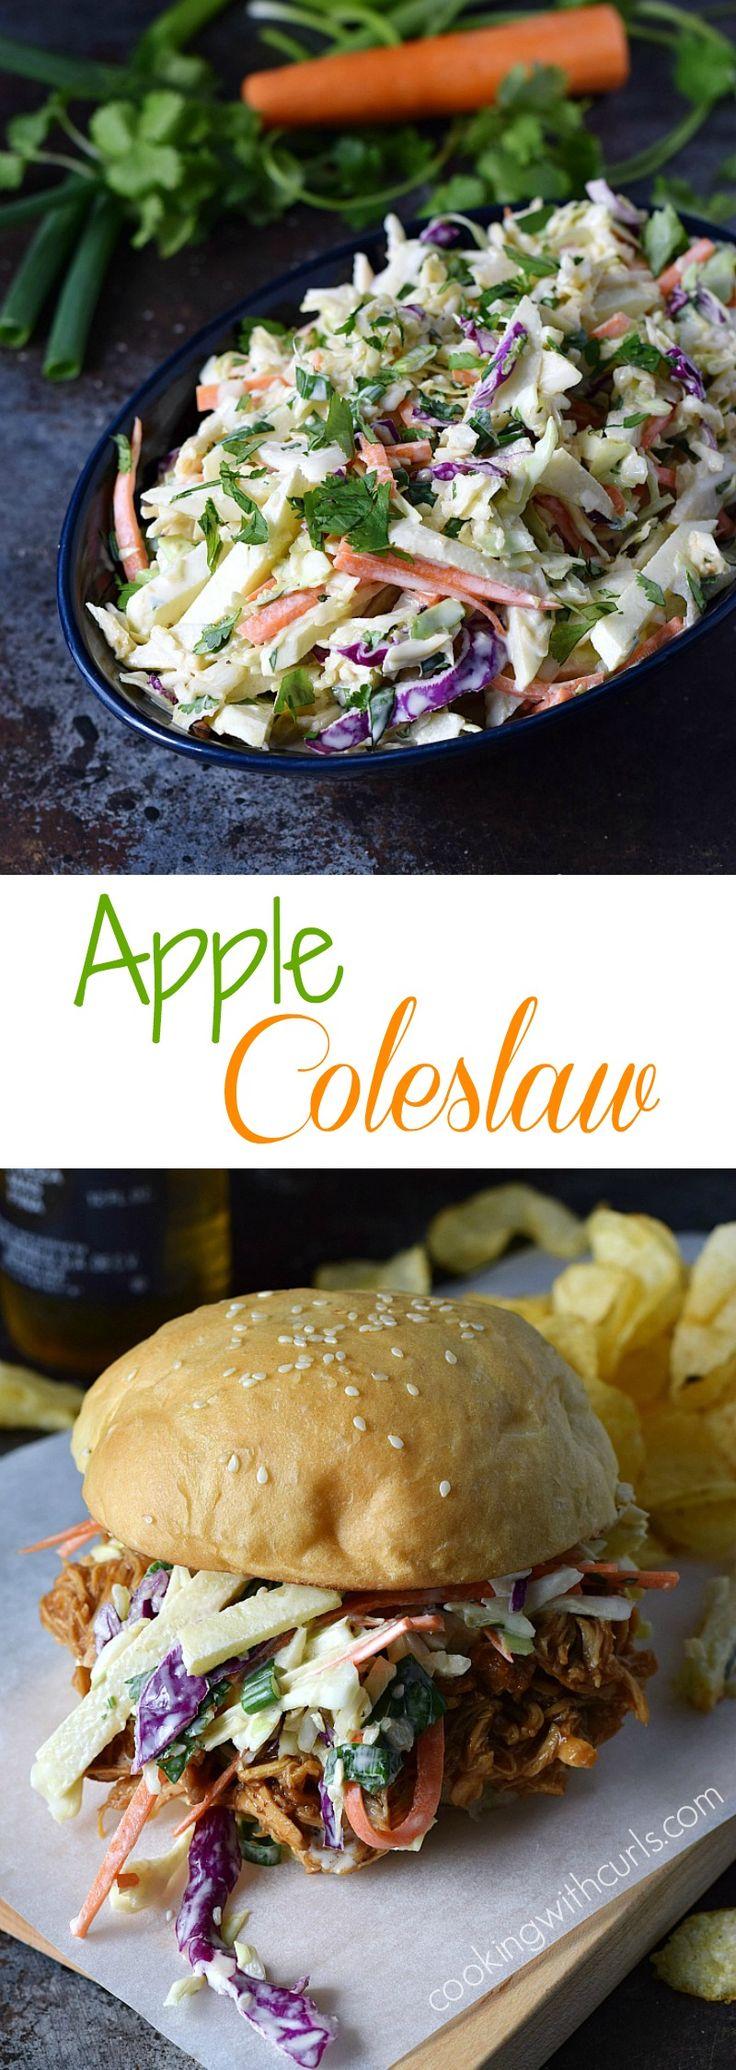 Coleslaw clipart bbq time On Apple coleslaw Best Apple